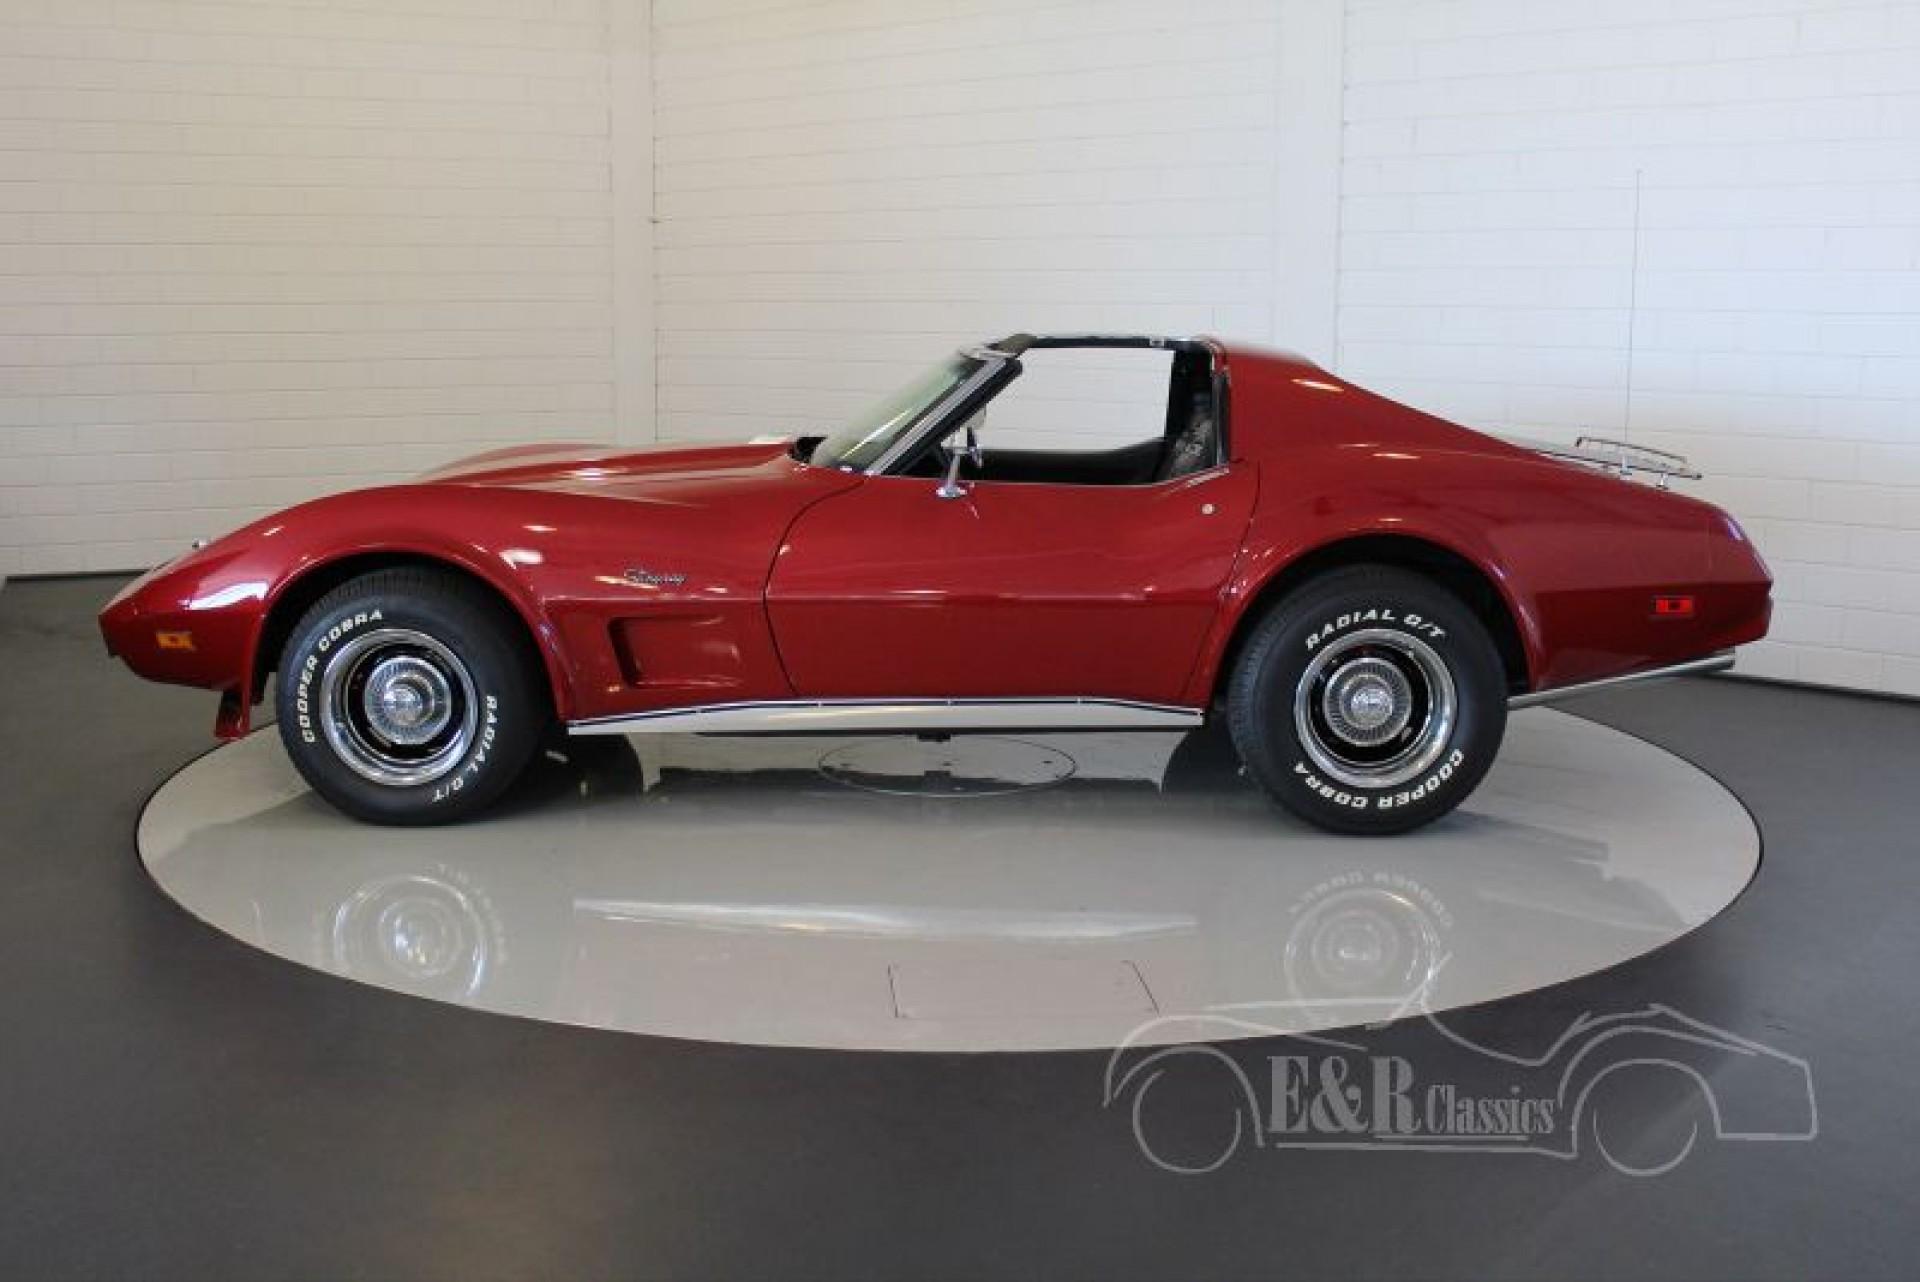 chevrolet corvette c3 1975 vendre erclassics. Black Bedroom Furniture Sets. Home Design Ideas